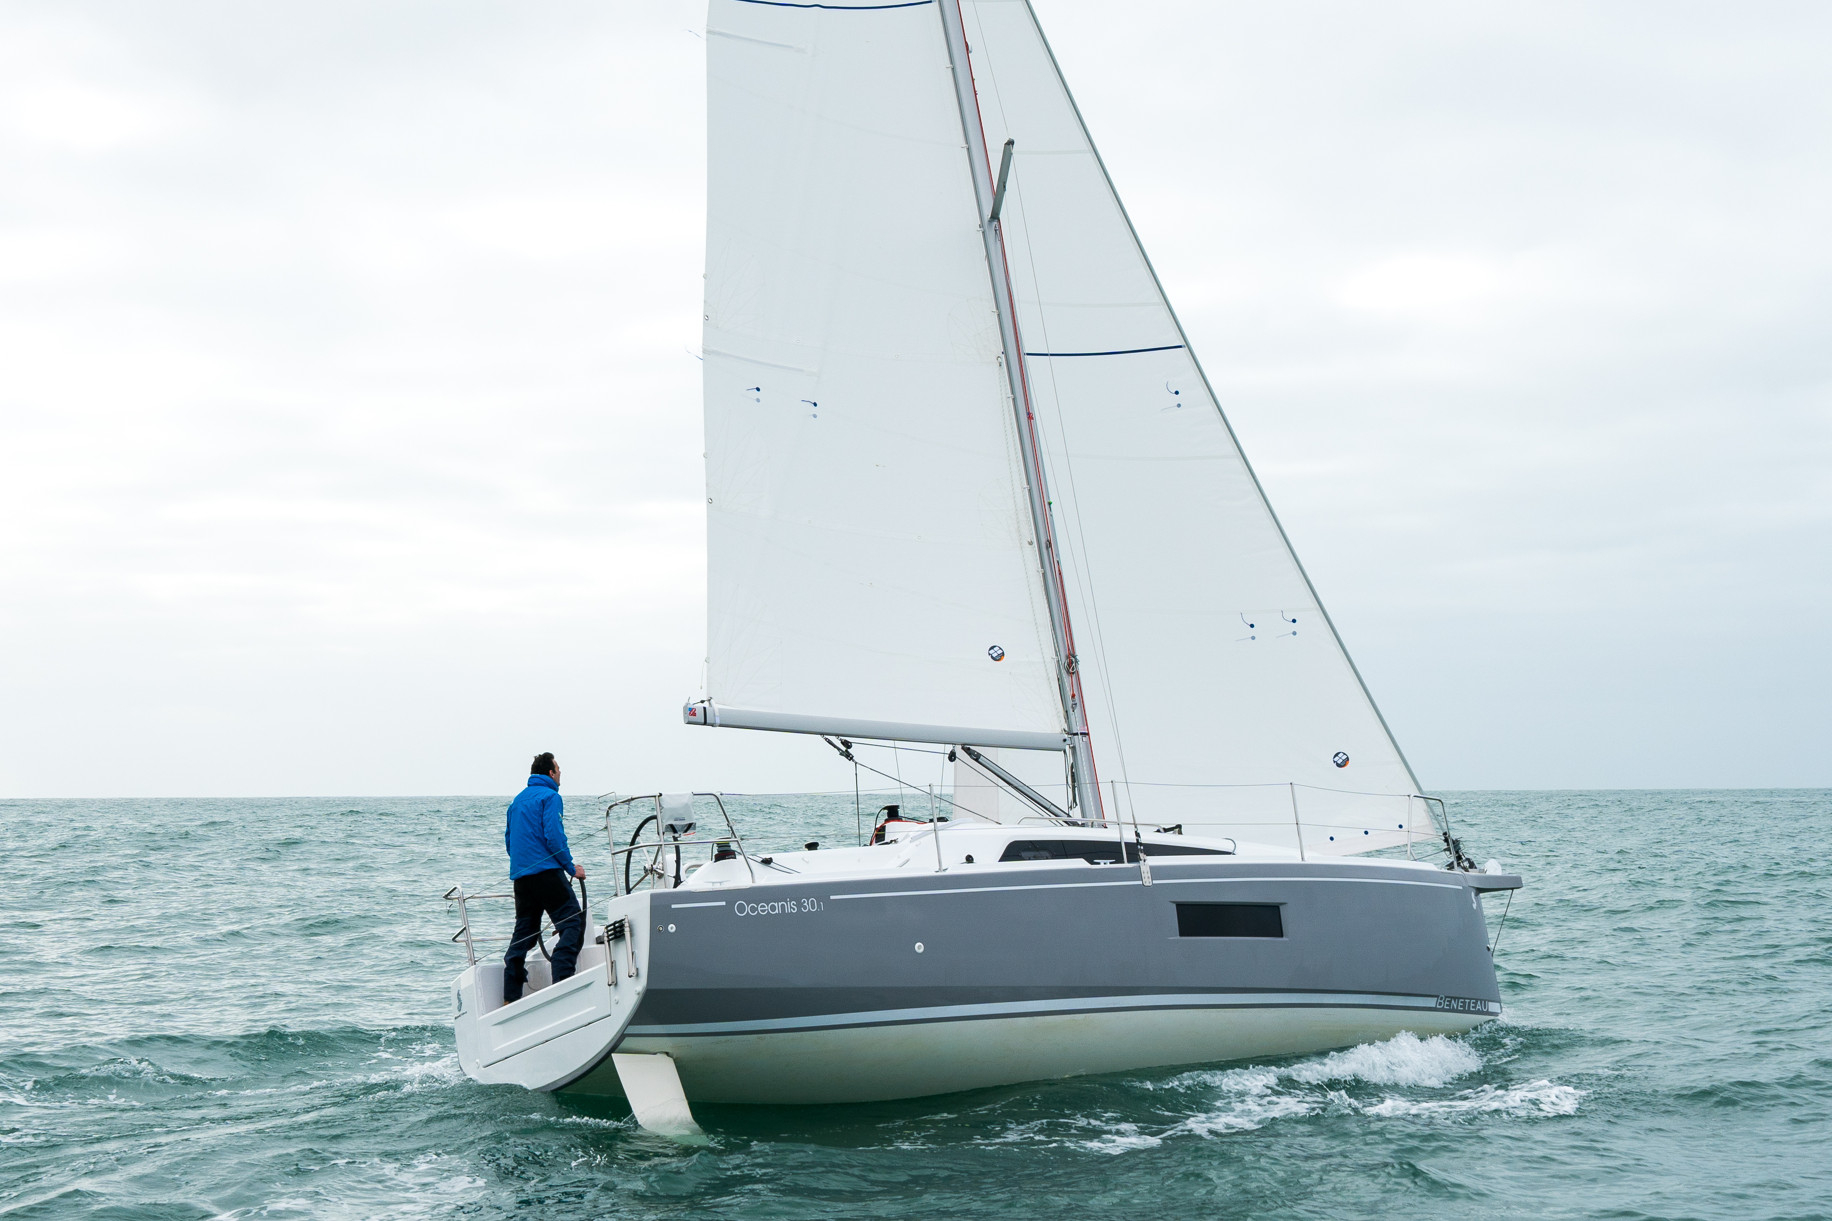 Oceanis 30.1-thumb-1